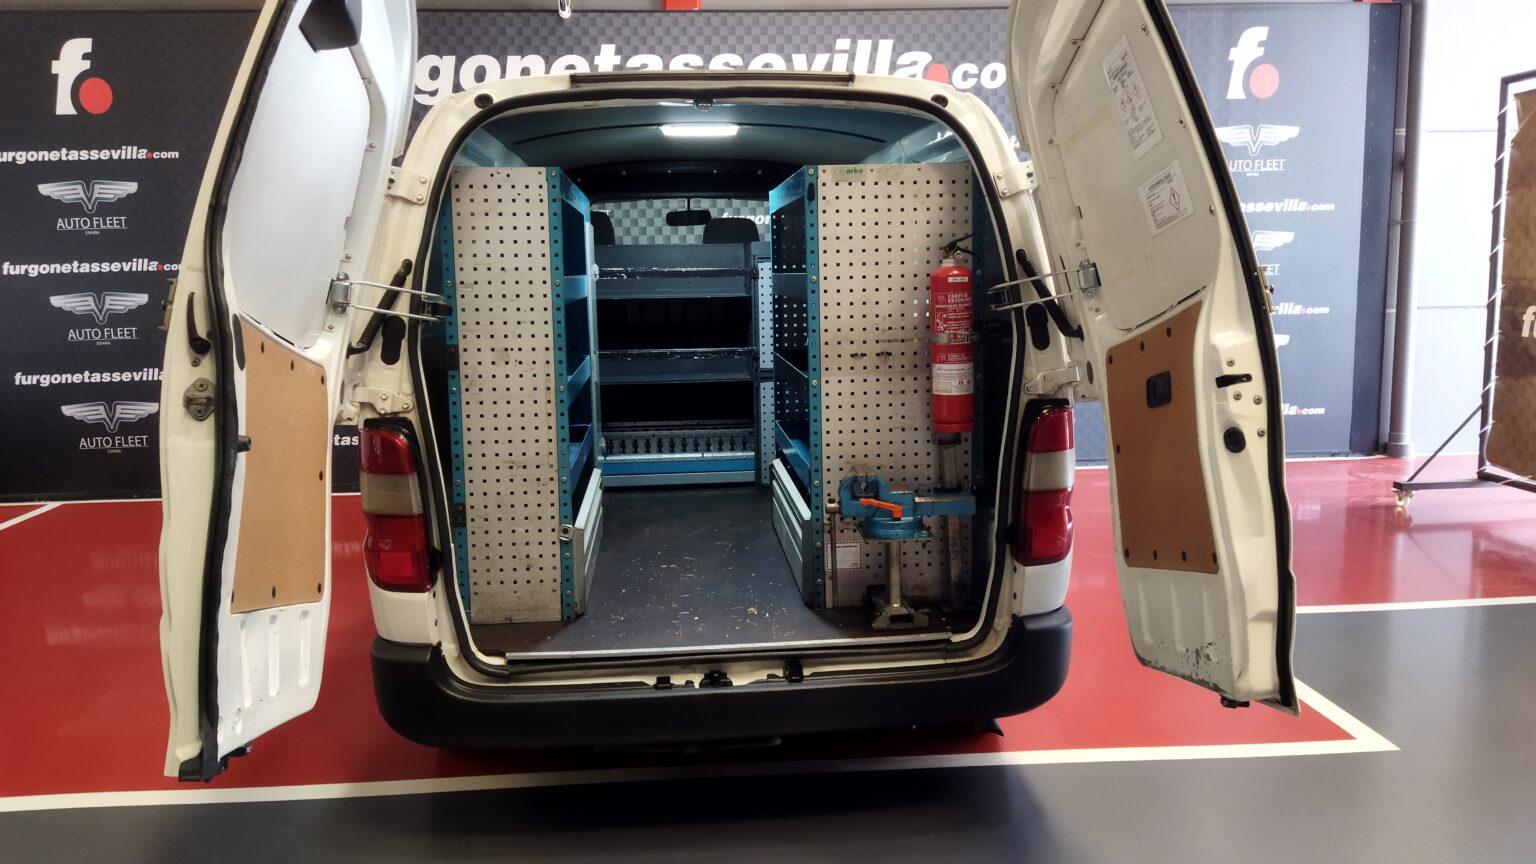 Furgoneta de segunda mano vehiculo taller movil toyota hiace